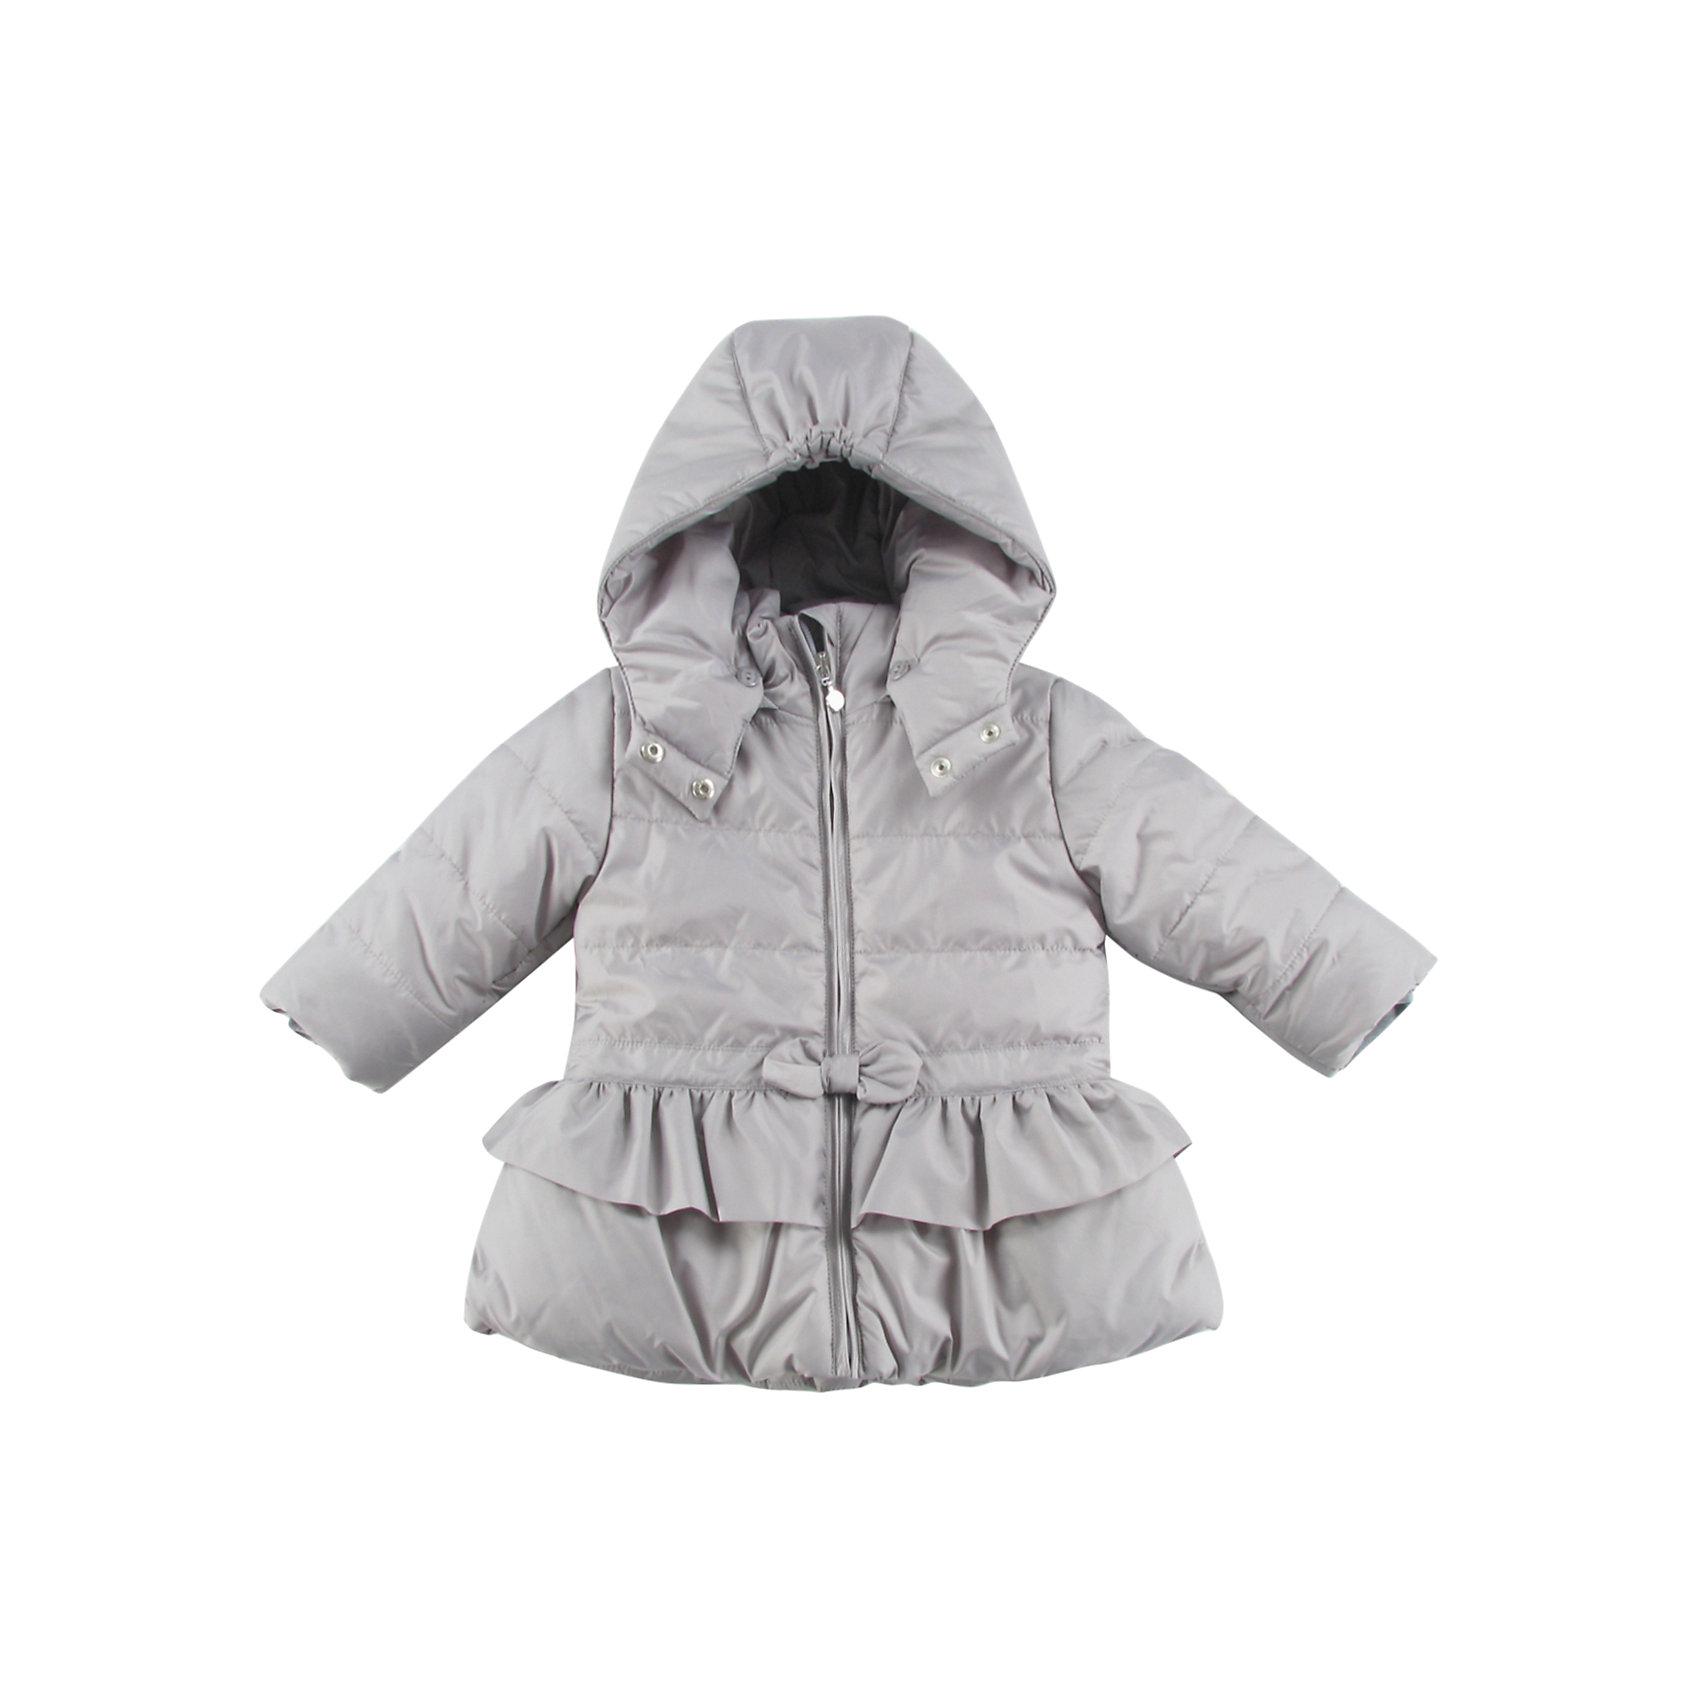 Куртка утепленная для девочки WojcikВерхняя одежда<br>Куртка утепленная для девочки Wojcik<br>Состав:<br>Полиэстер 100%<br><br>Ширина мм: 356<br>Глубина мм: 10<br>Высота мм: 245<br>Вес г: 519<br>Цвет: серый<br>Возраст от месяцев: 24<br>Возраст до месяцев: 36<br>Пол: Женский<br>Возраст: Детский<br>Размер: 98,74,80,86,92<br>SKU: 5590878